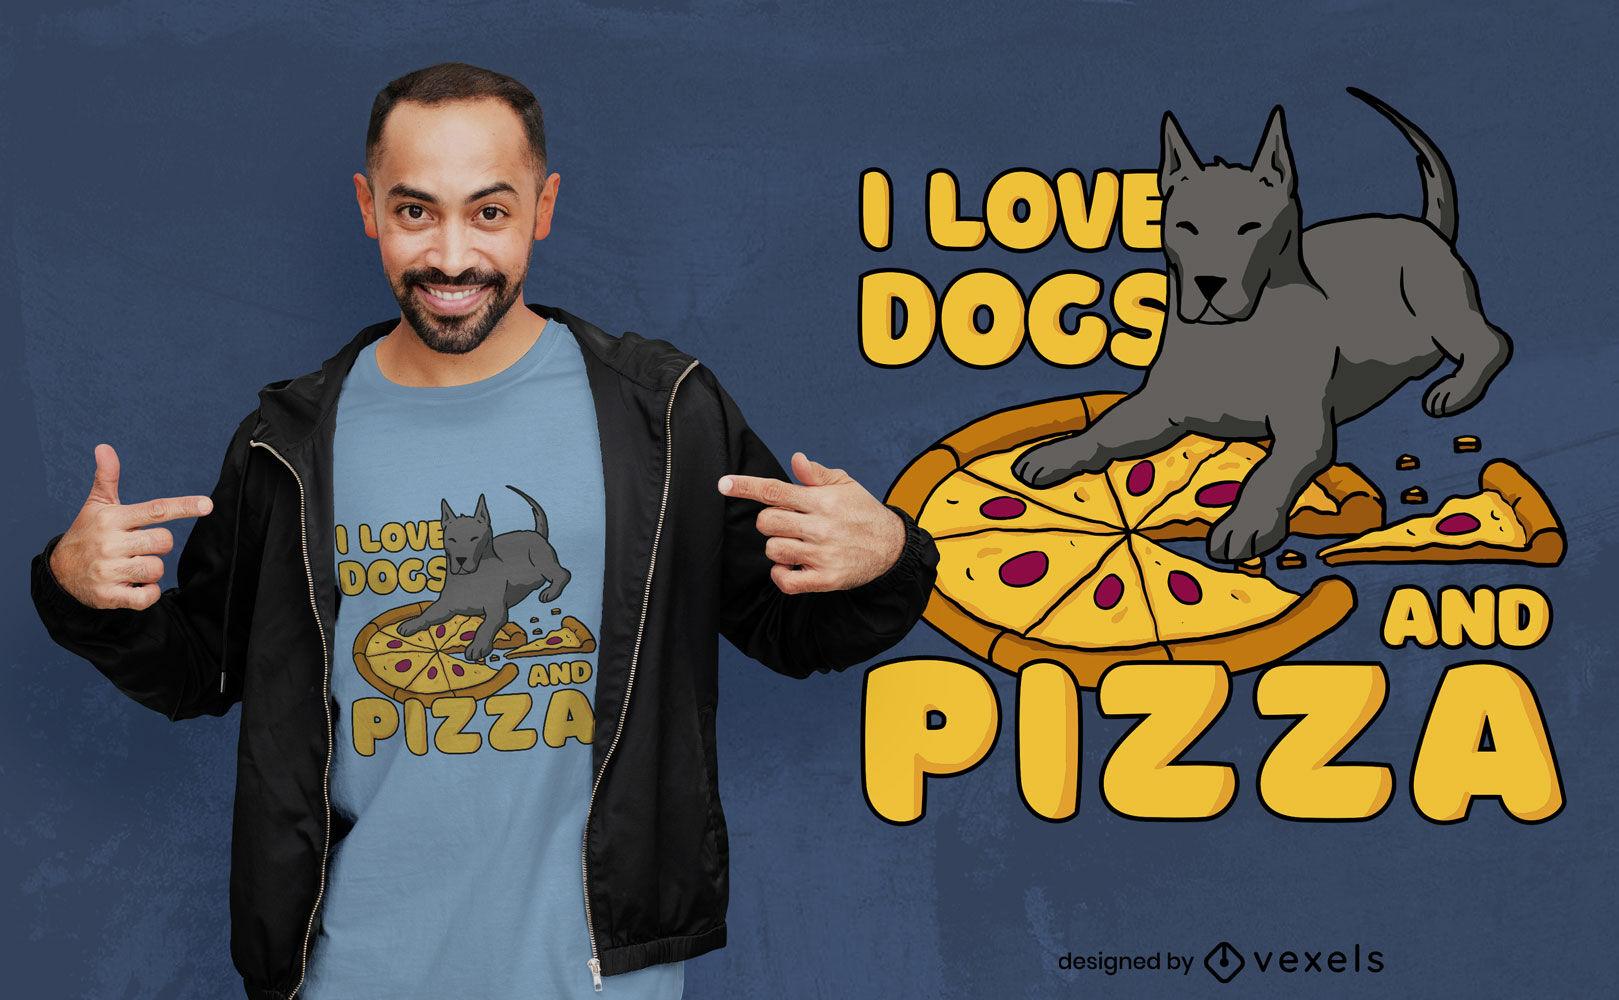 Love dogs & pizza t-shirt design